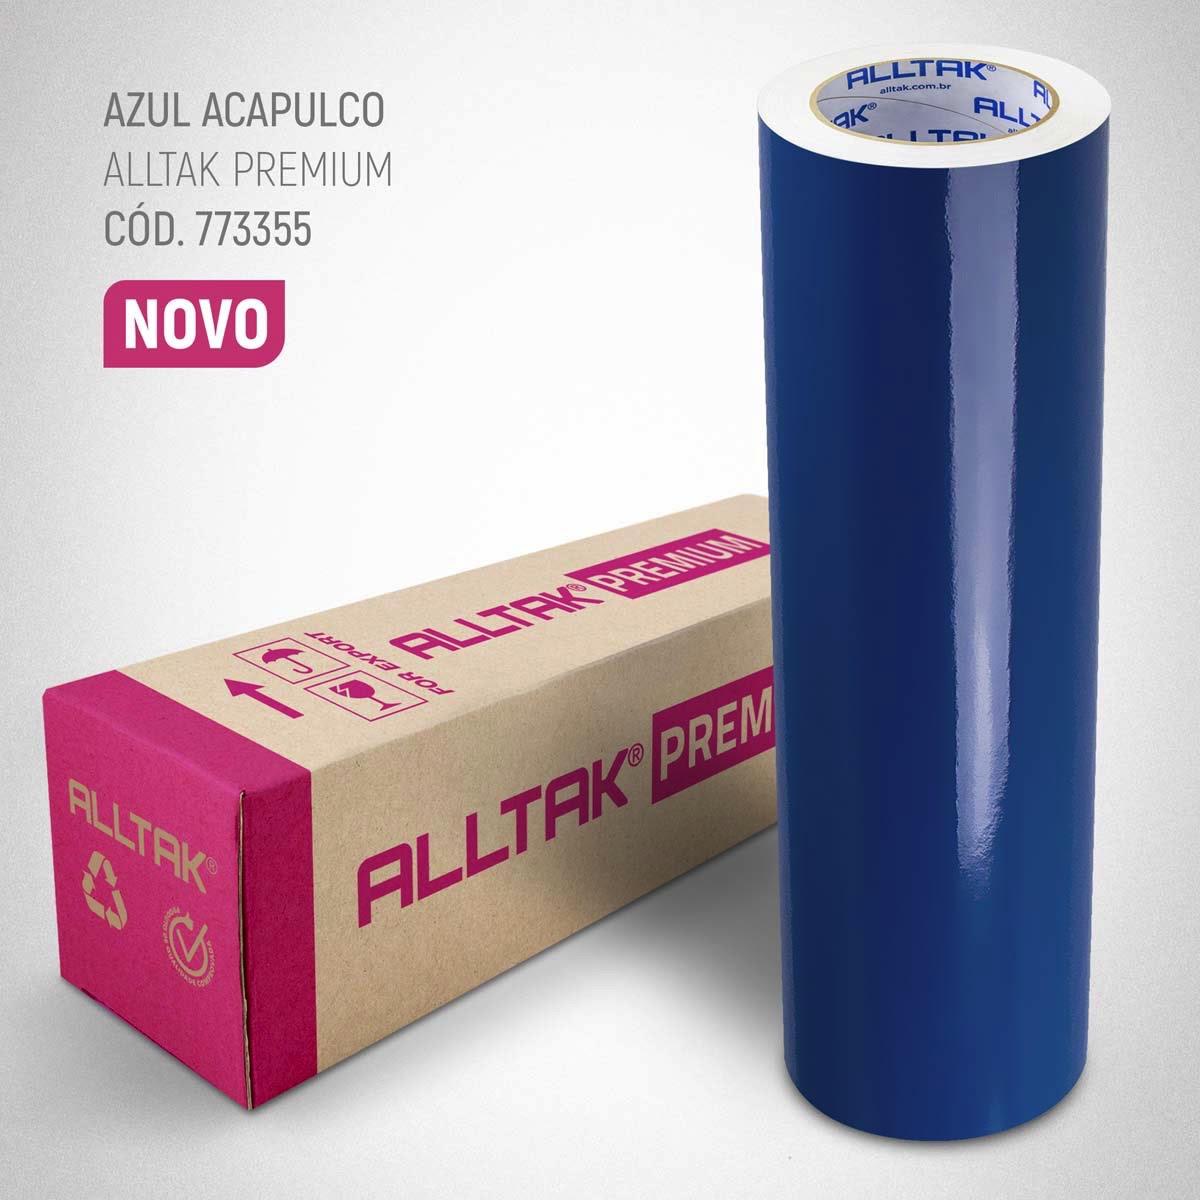 AZUL ACAPULCO 0,08X1,22